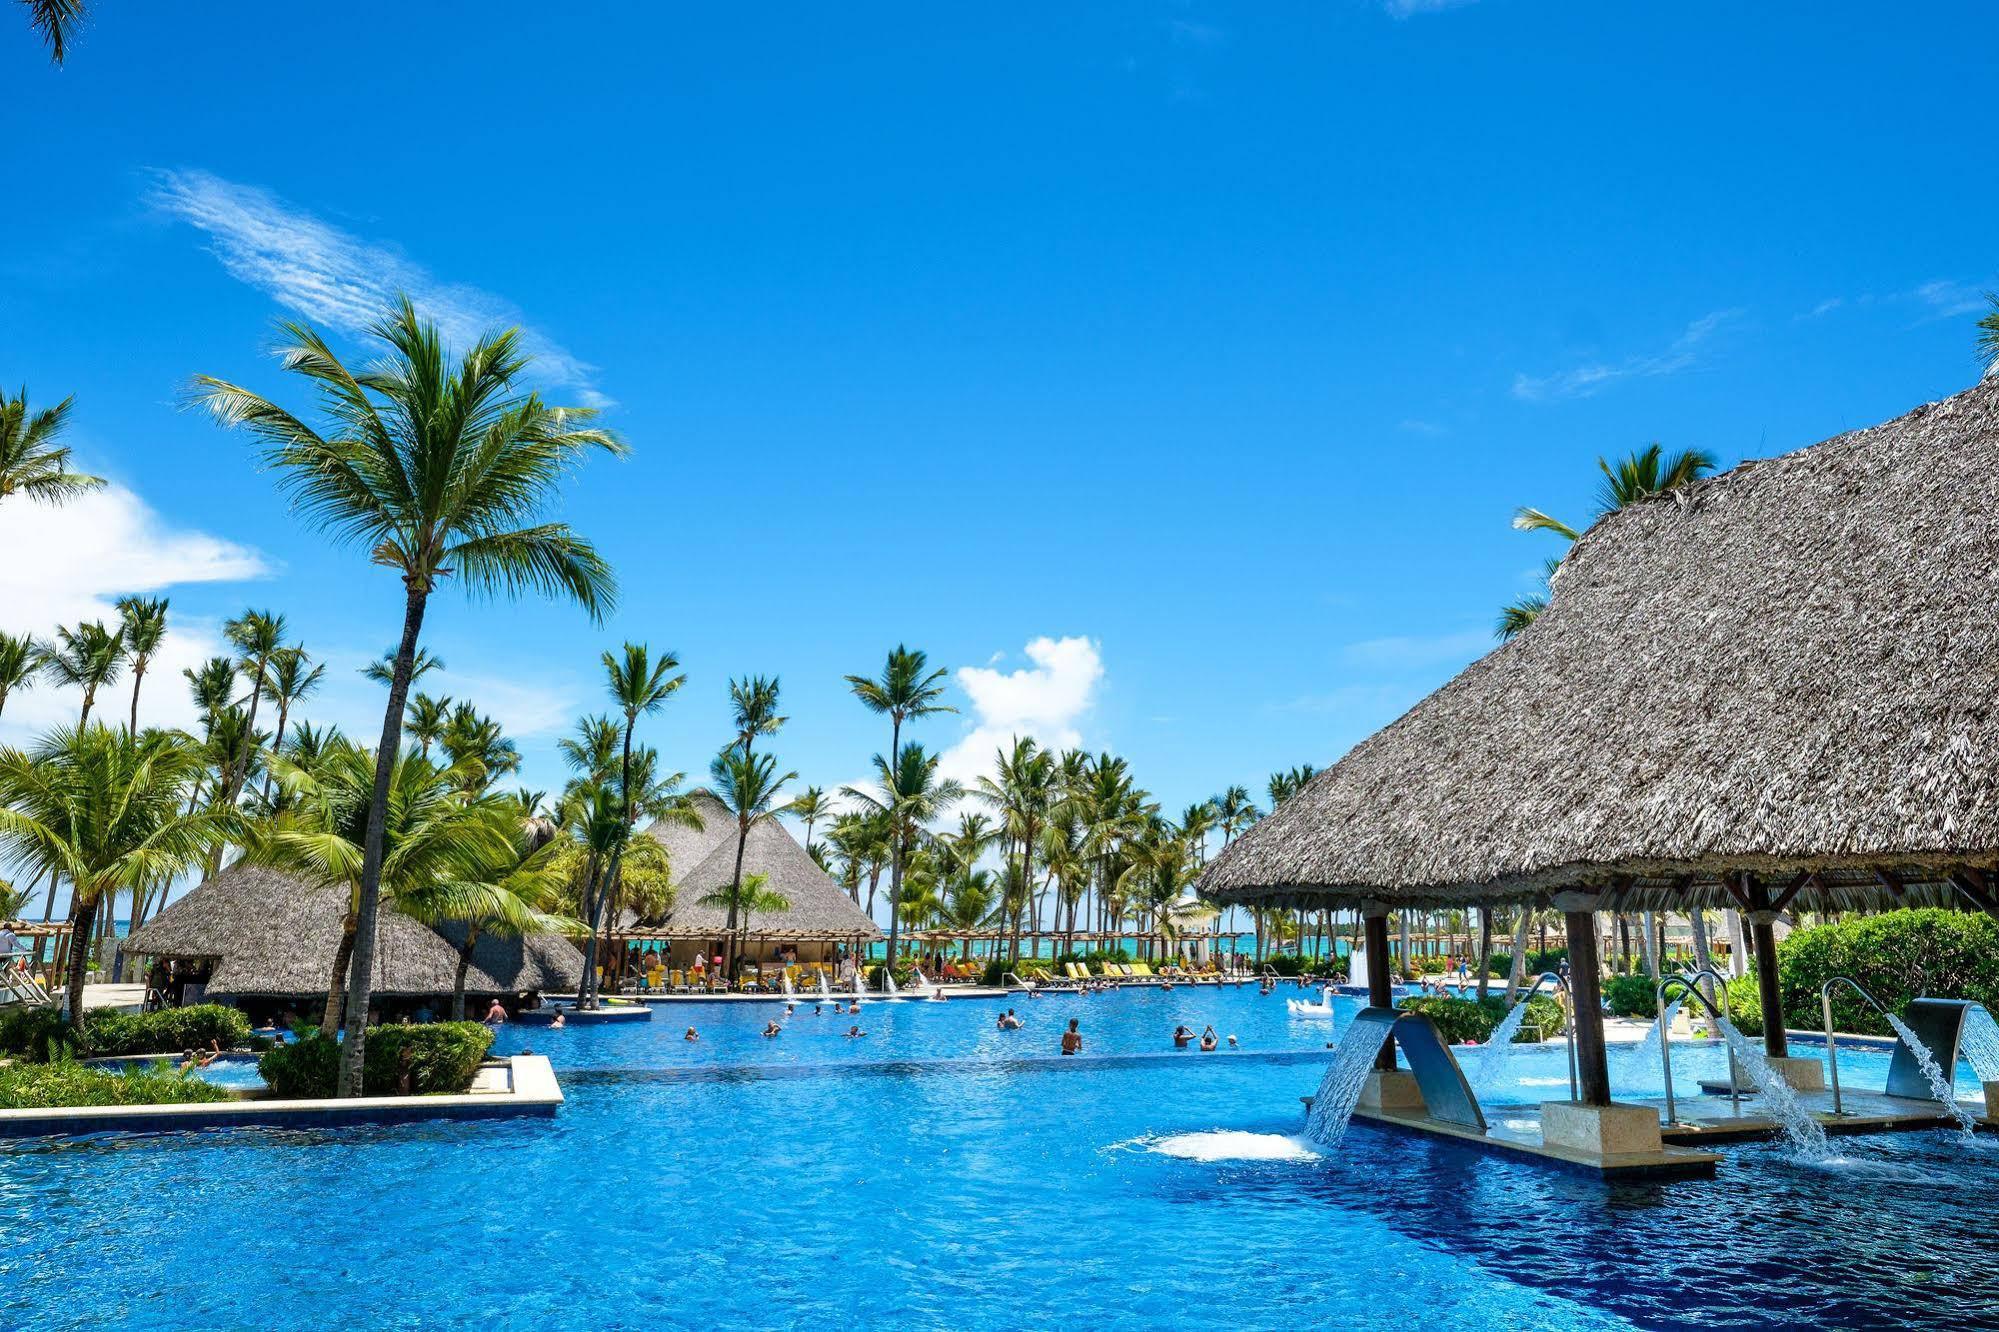 dominican-republic-sex-resorts-red-tube-femdom-wrestling